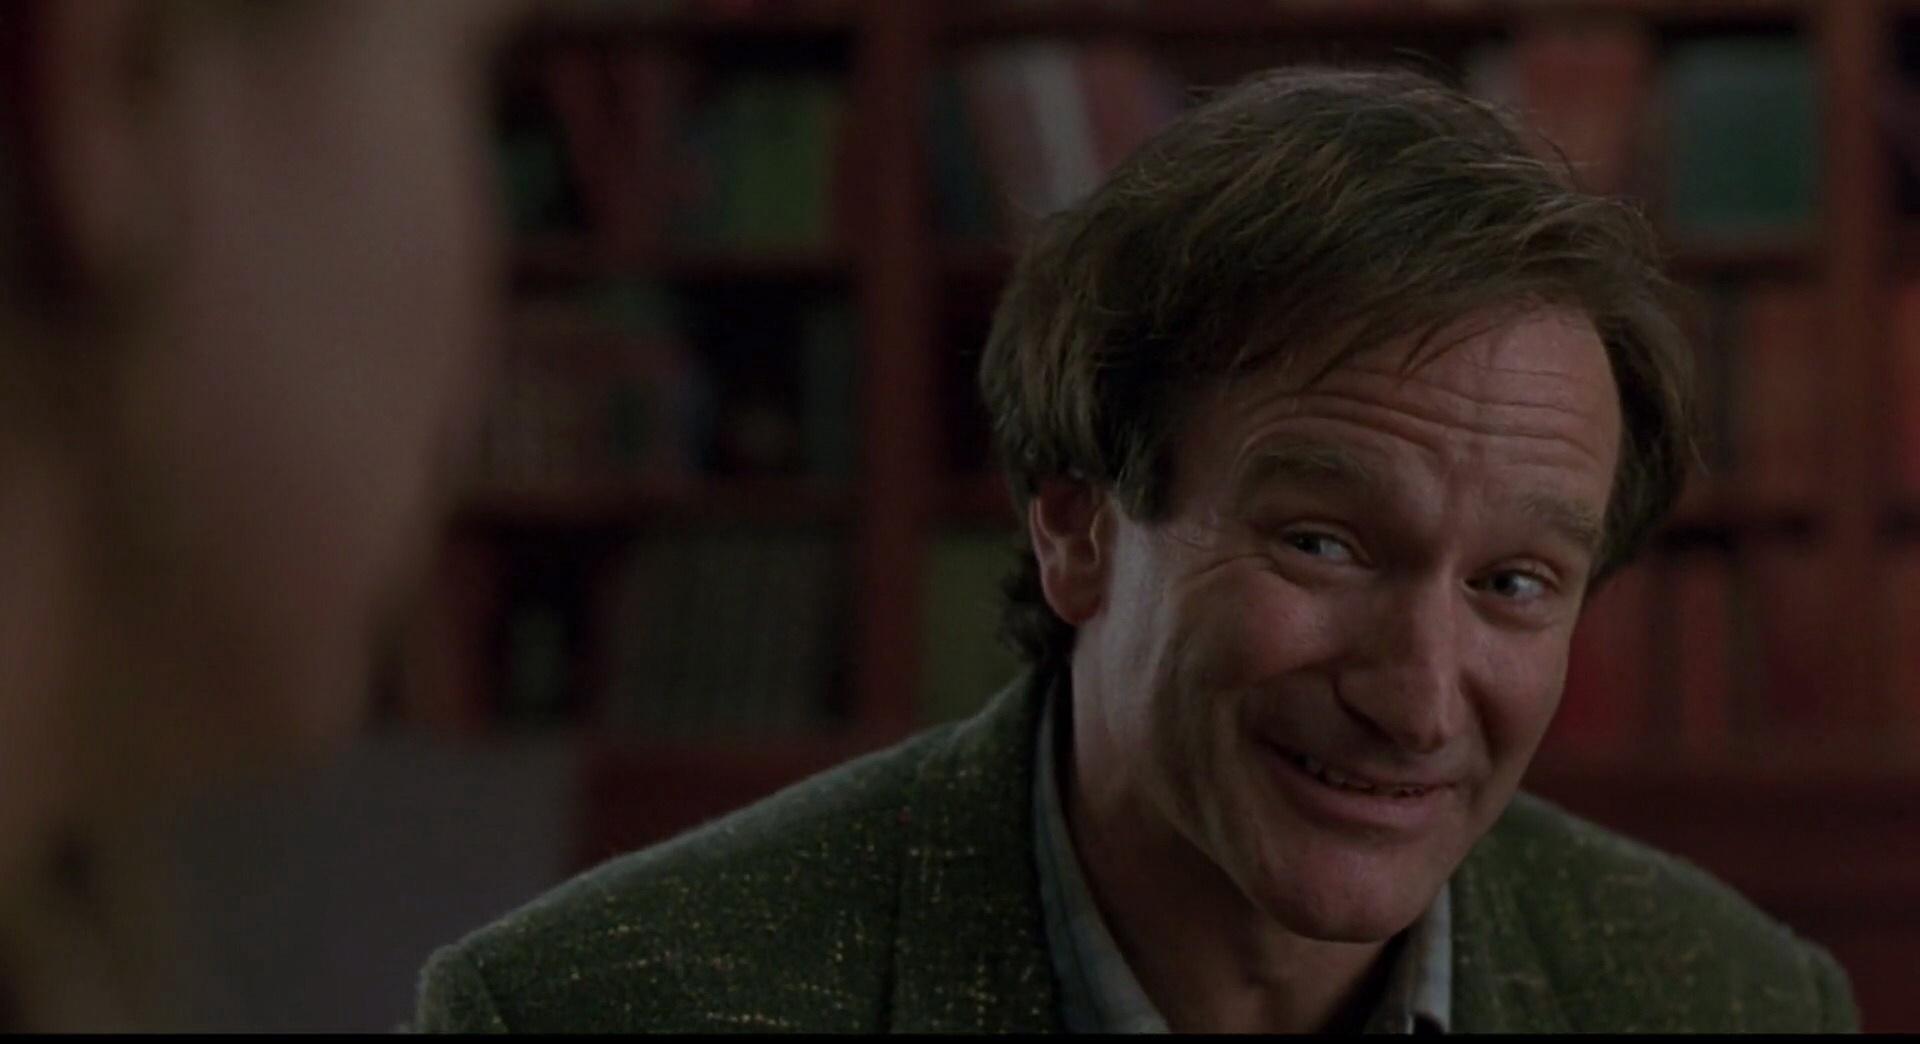 Robin Williams Jumanji images